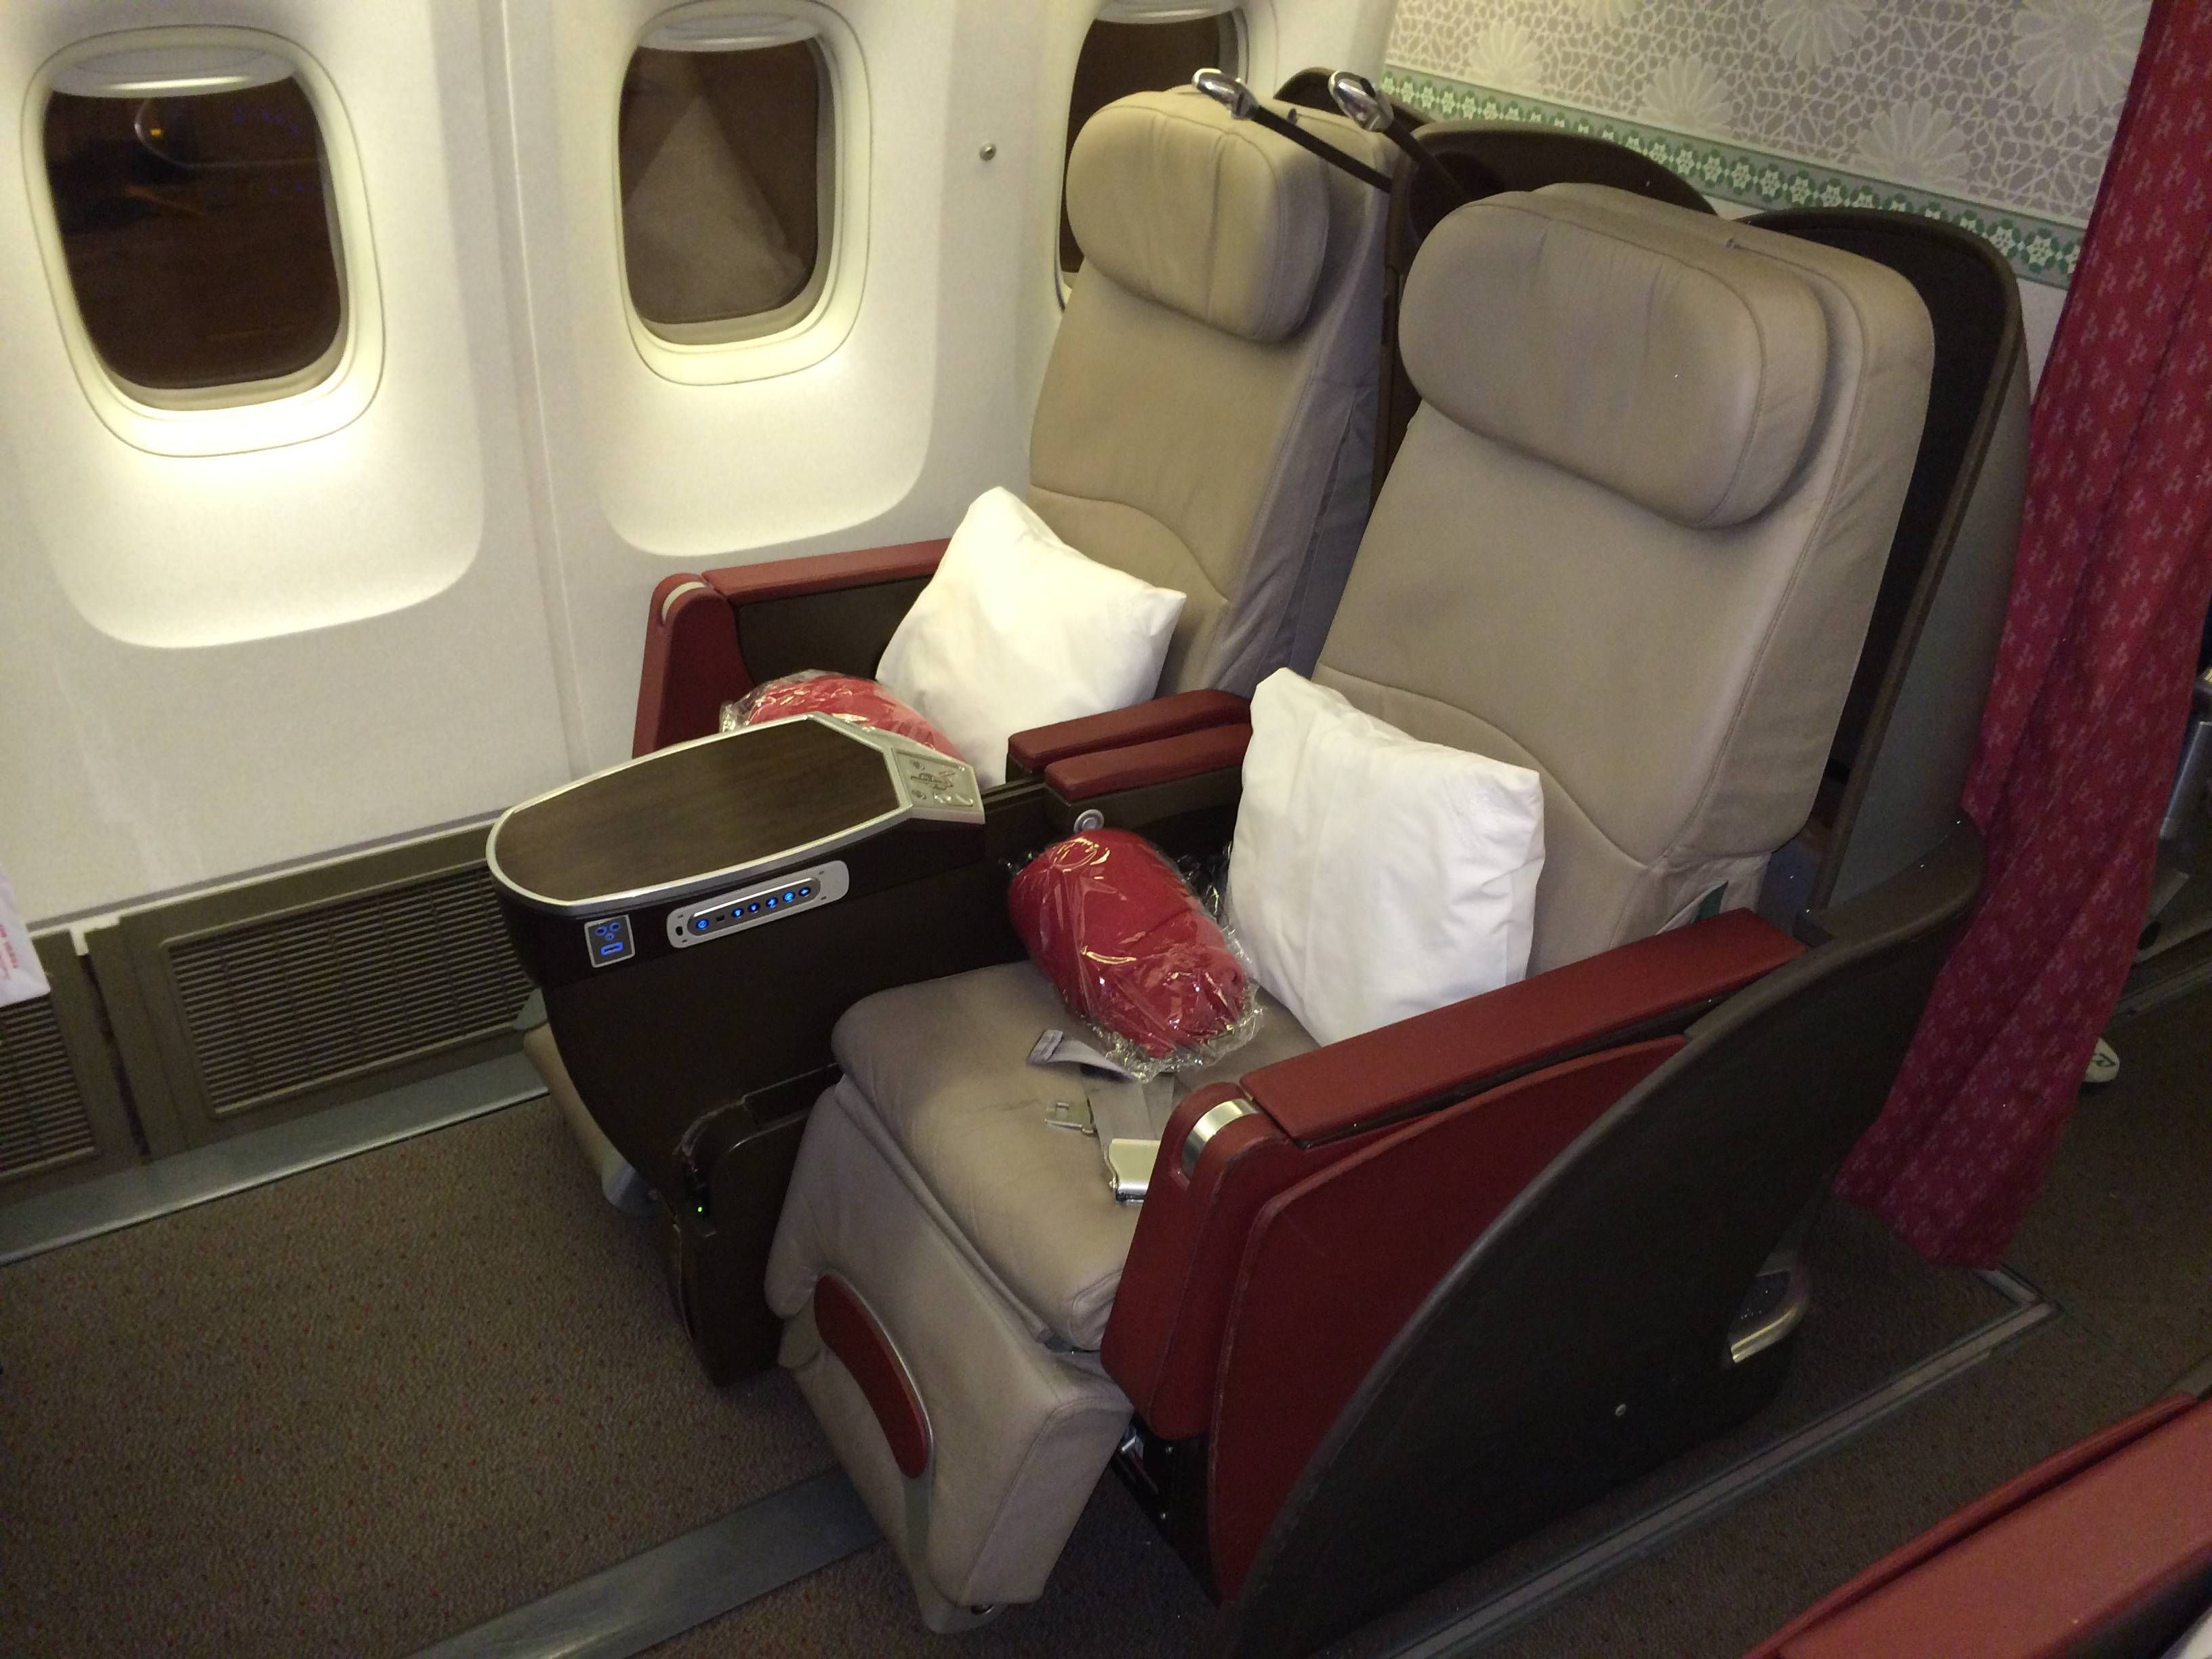 Royal Air Maroc Classe Executiva B767-300 Business Class